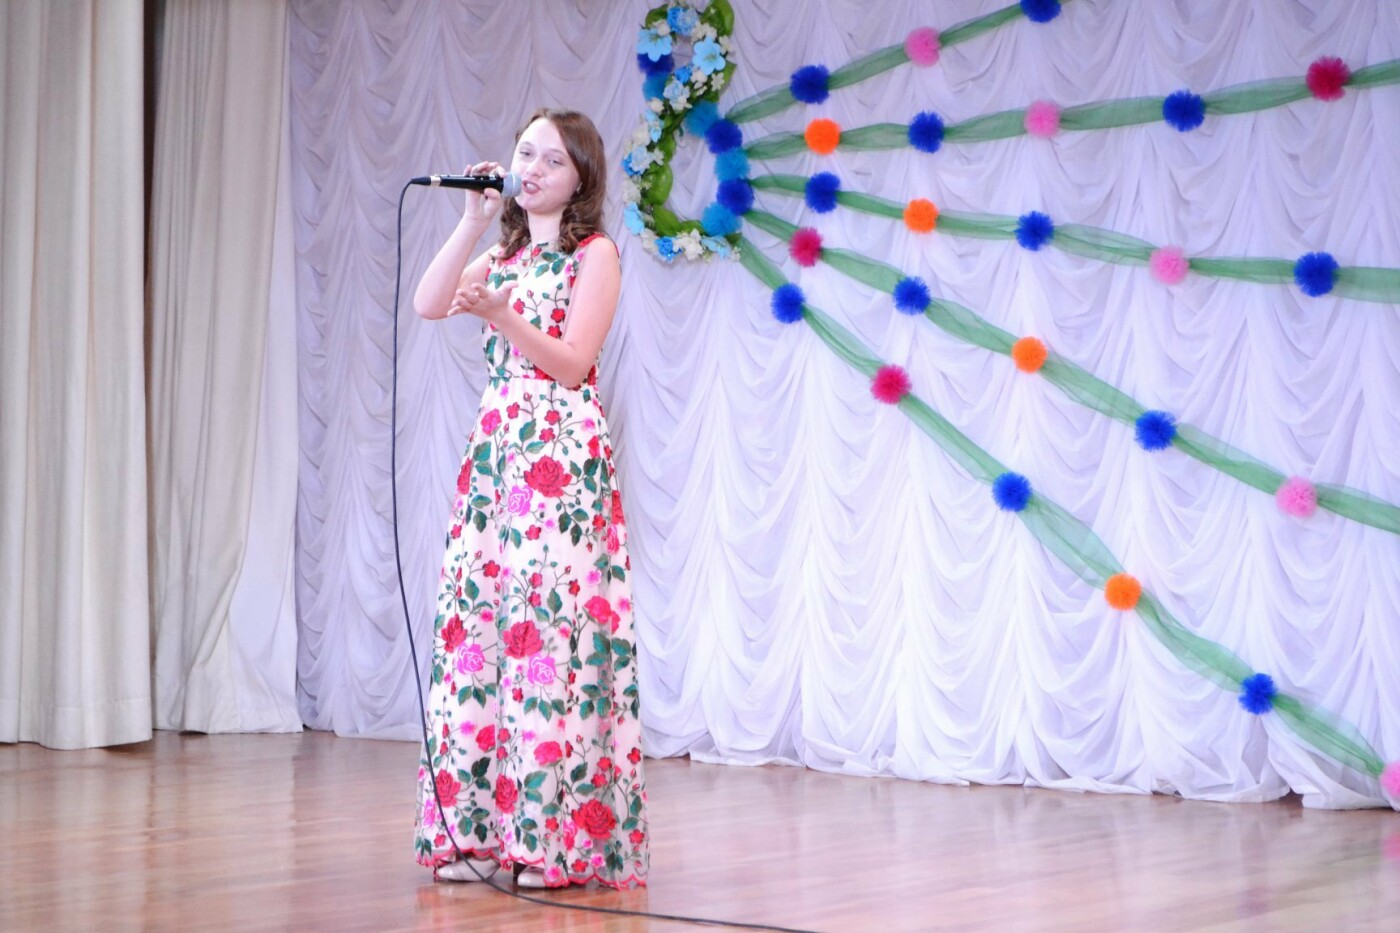 В селе Малодолинское поздравили женщин с 8 Марта, фото-11